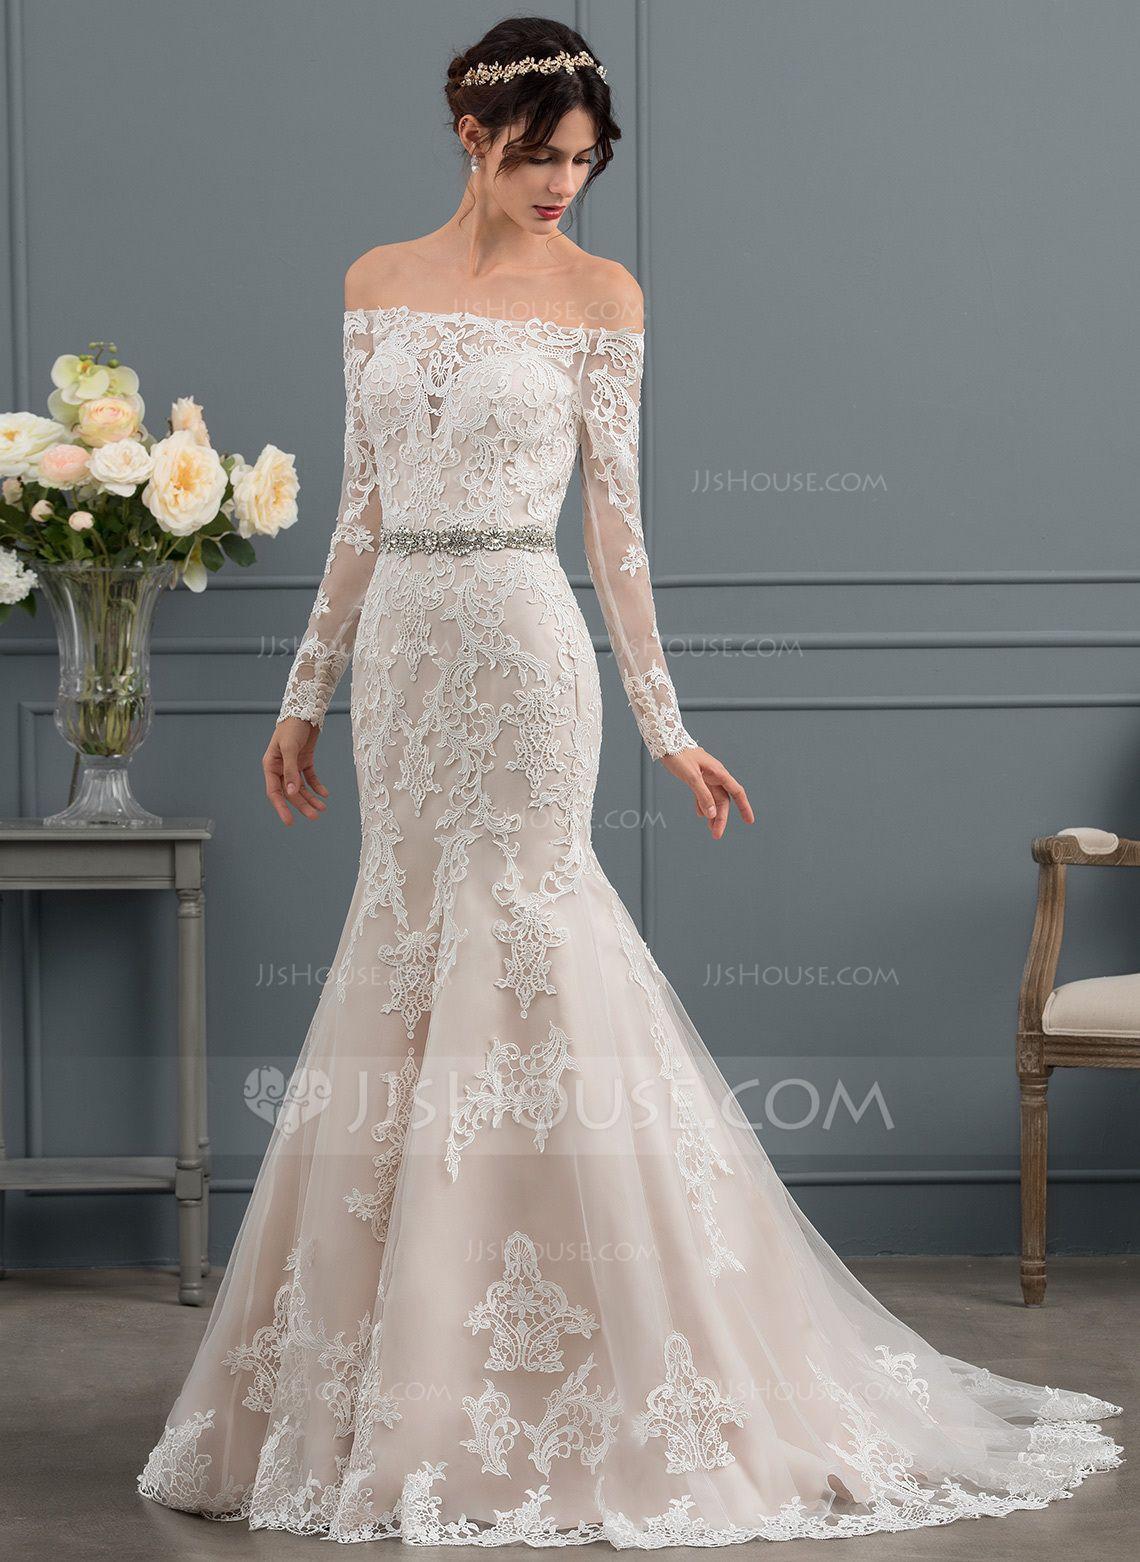 254 00 Trumpet Mermaid Off The Shoulder Sweep Train Tulle Wedding Dress Jj S House Wedding Dresses Affordable Wedding Dresses Bridal Dresses [ 1562 x 1140 Pixel ]